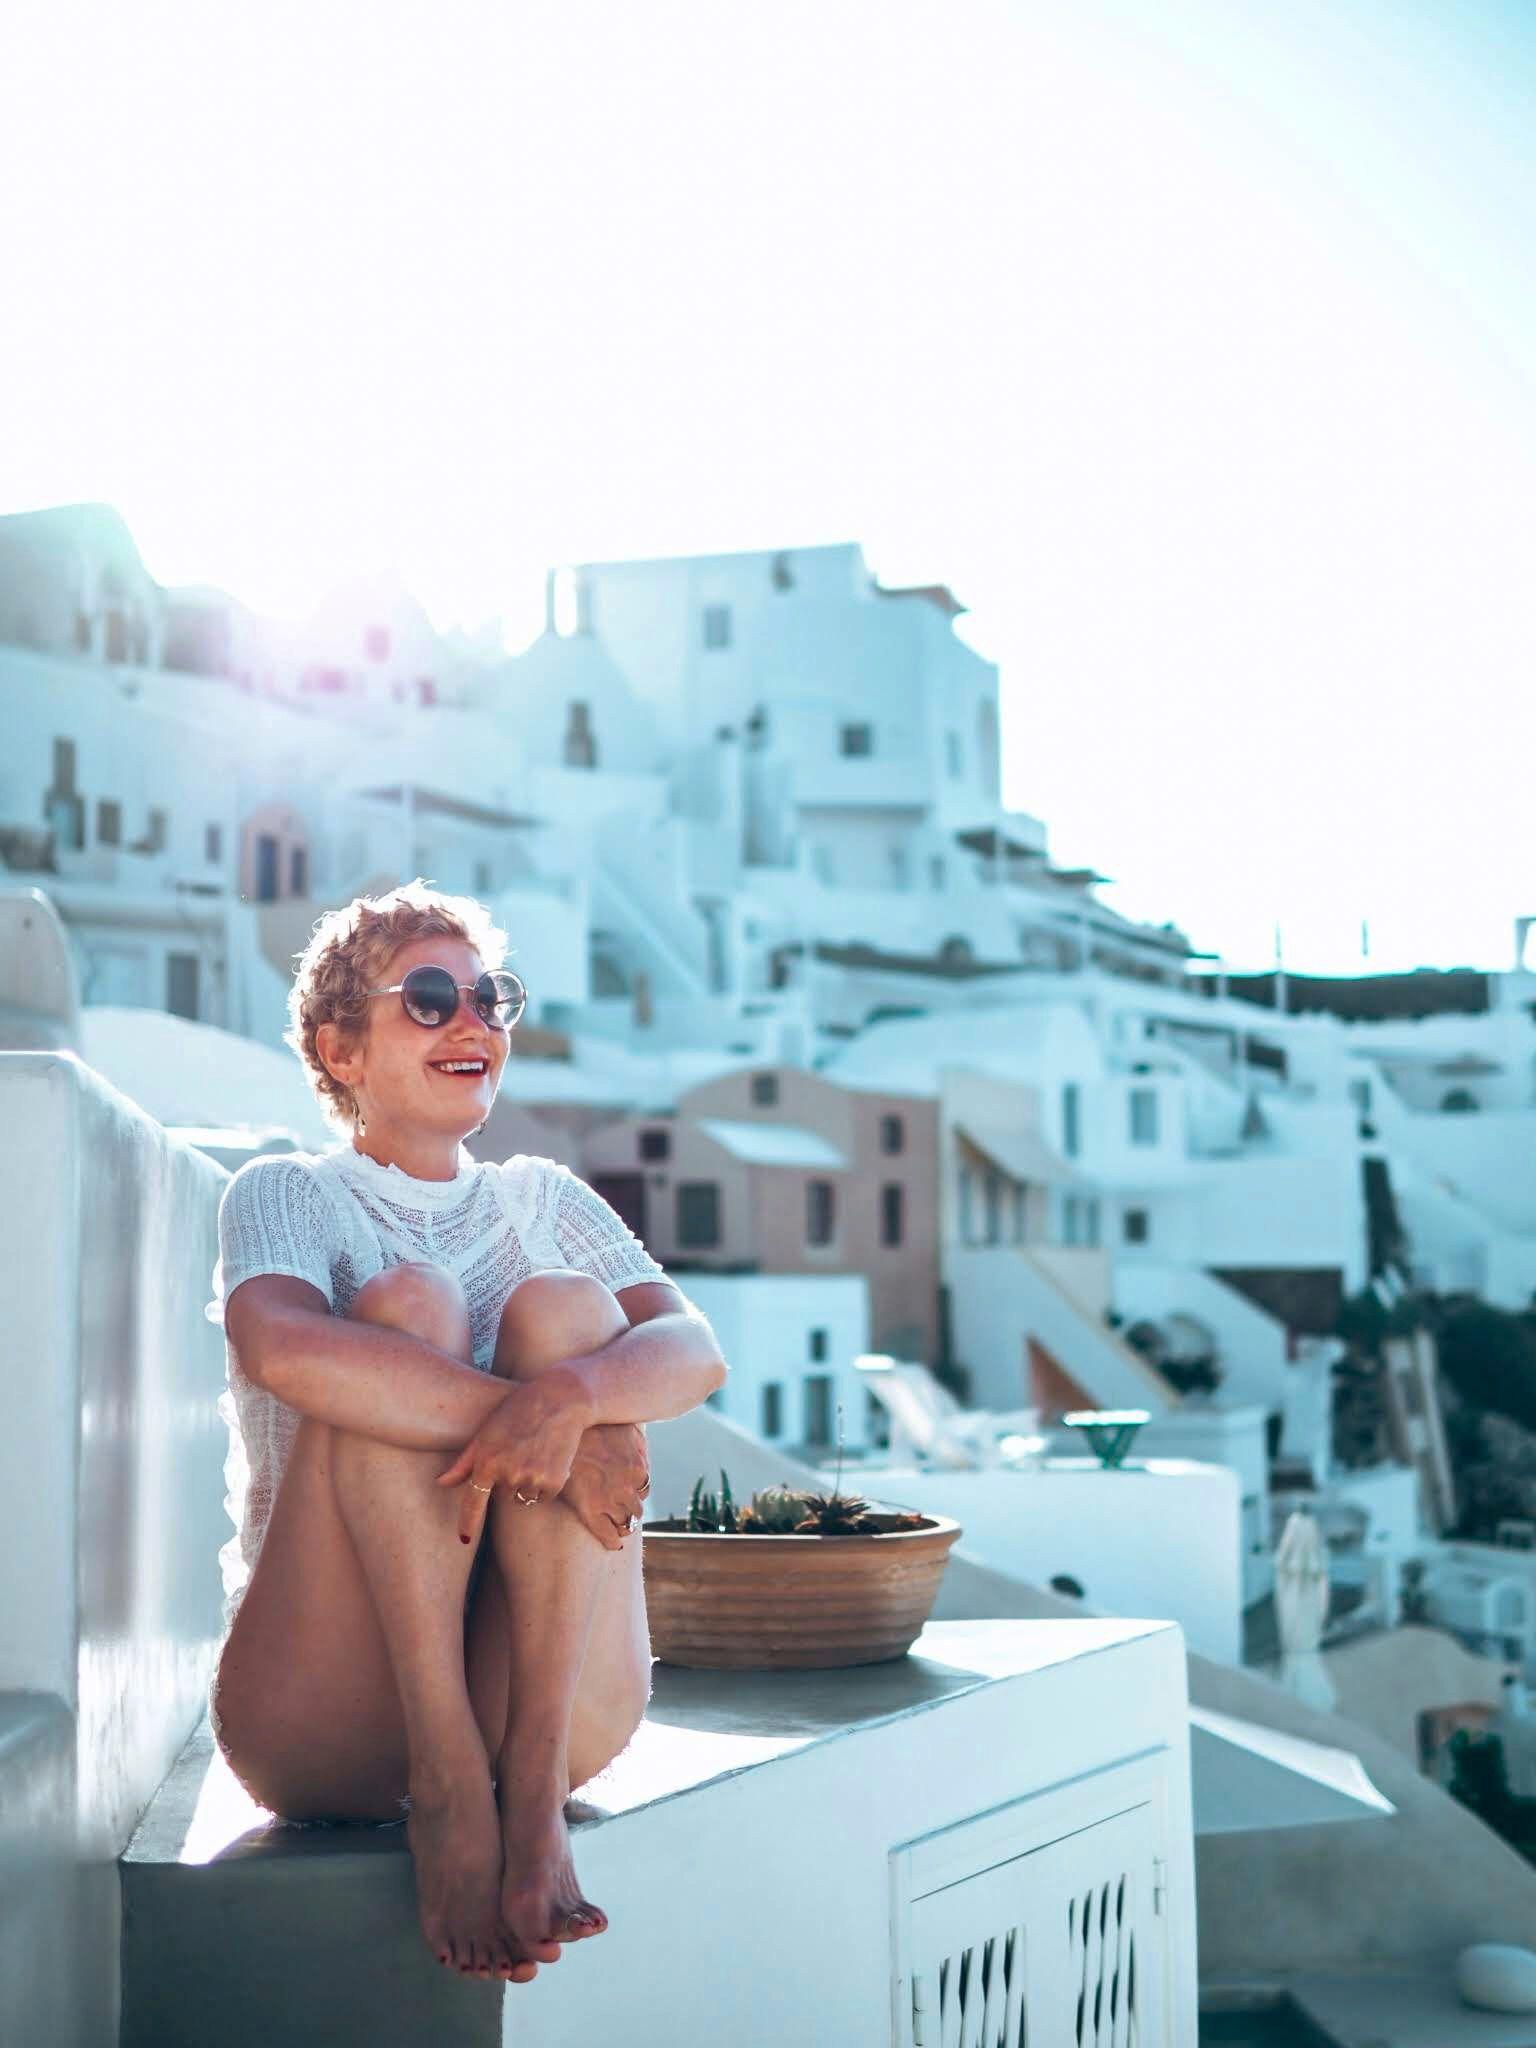 LEBEN / How to Sabbatical